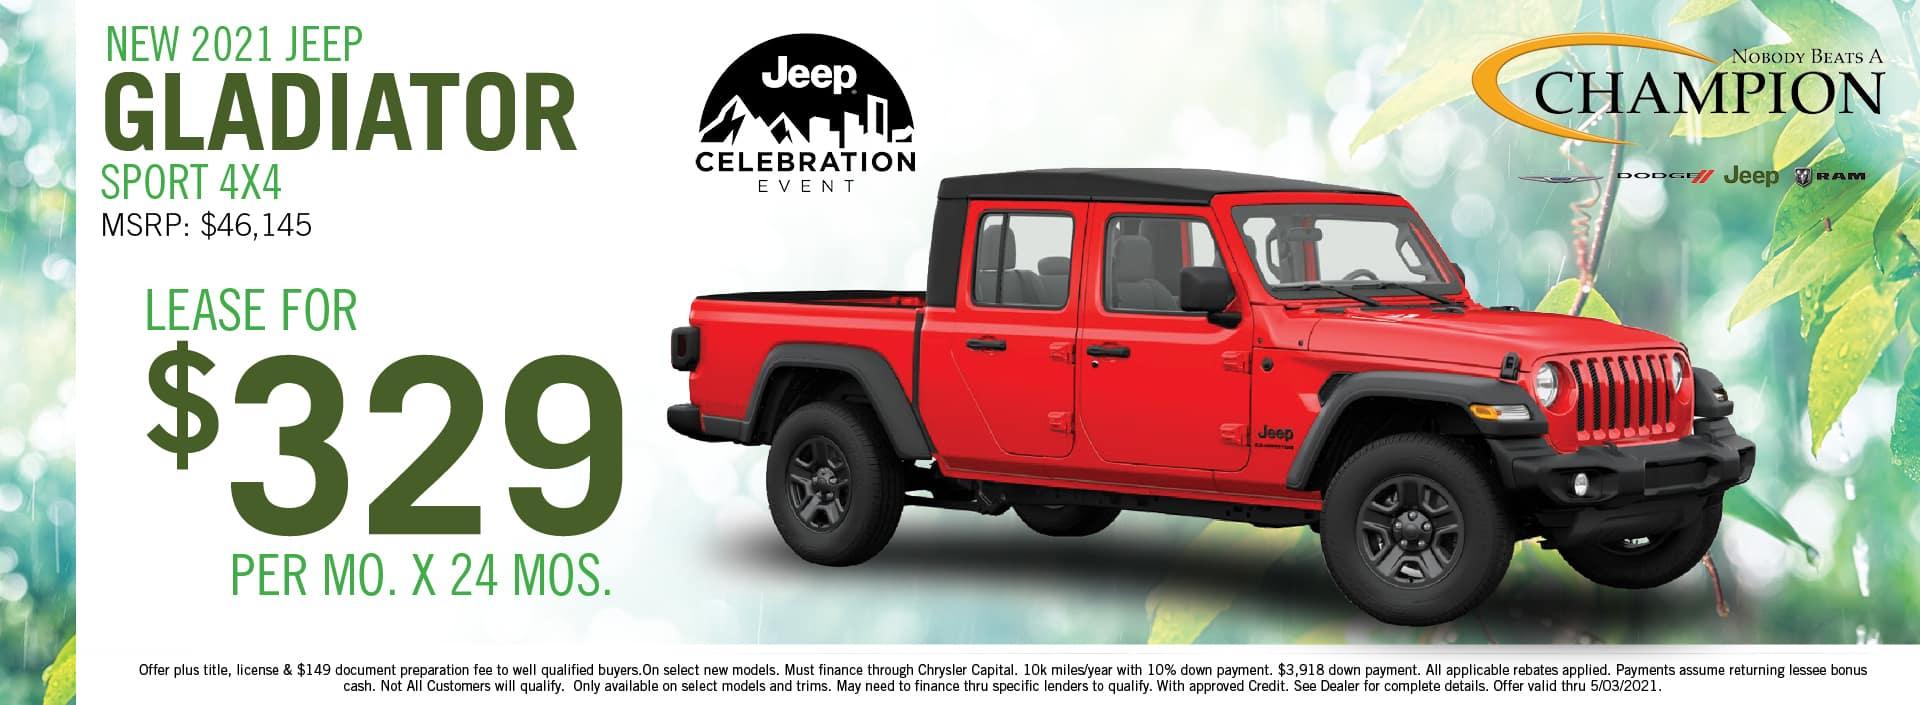 2021 Jeep Gladiator Lease Deals - Champion CDJR